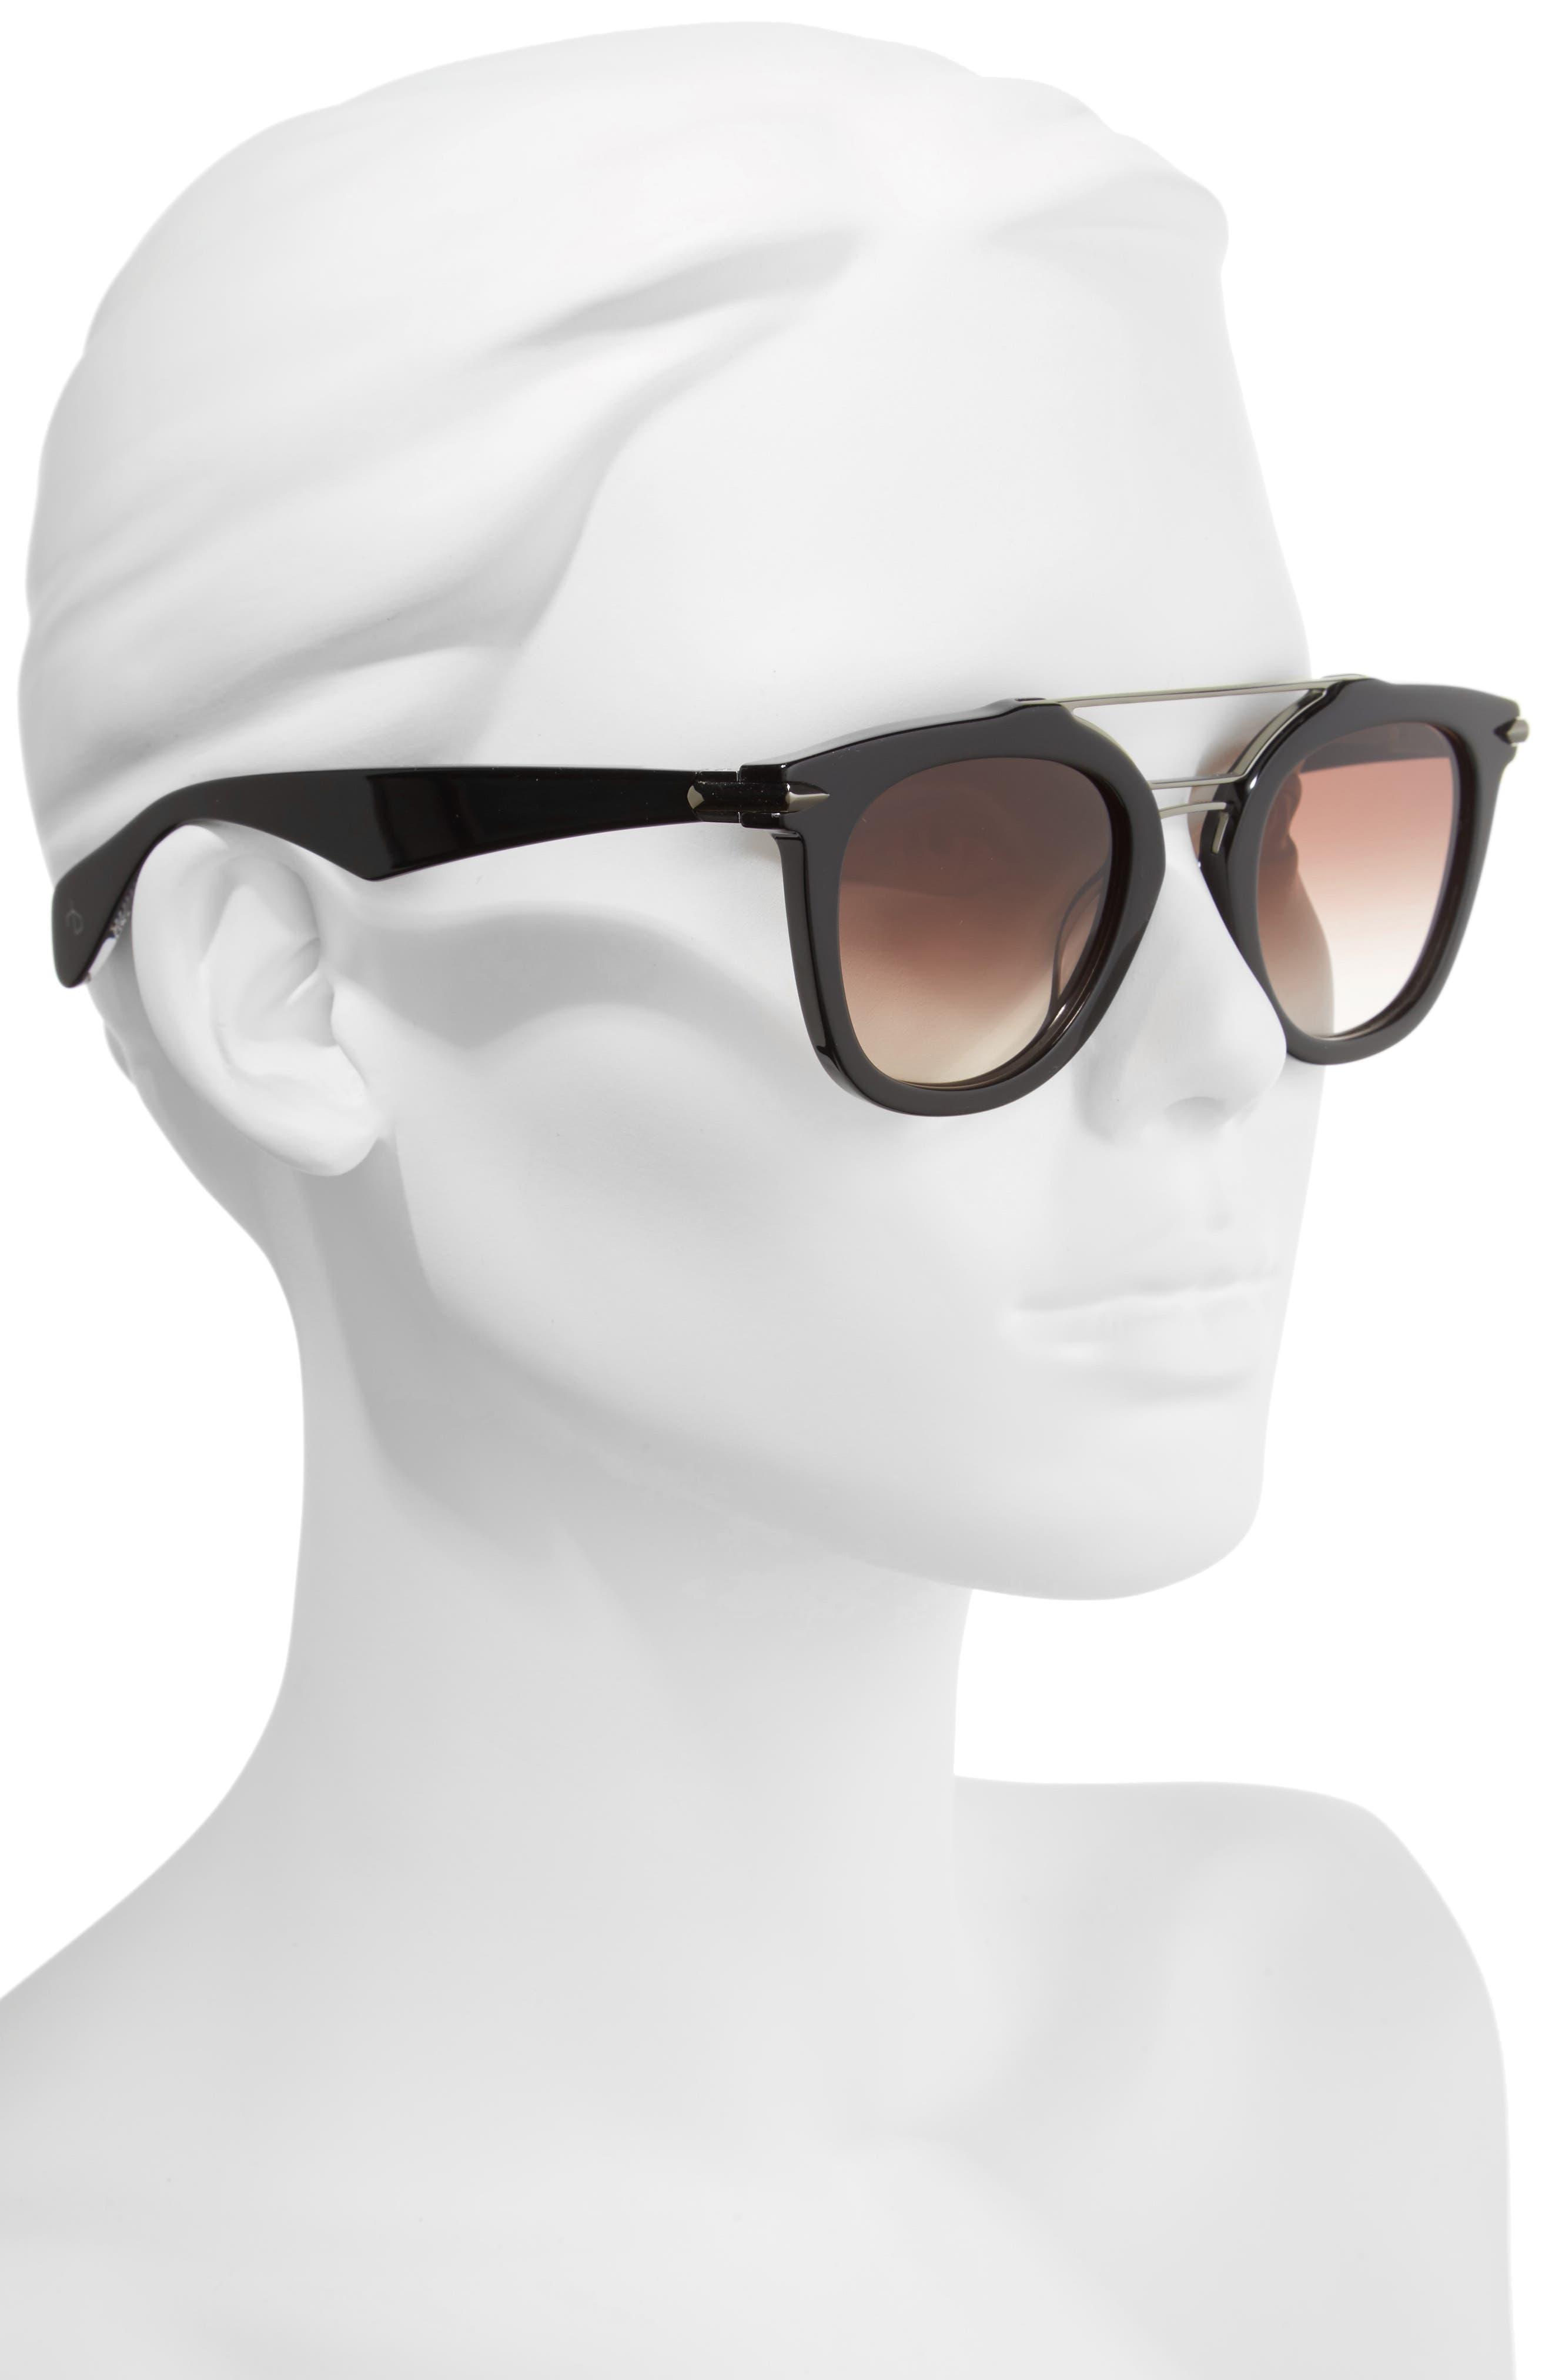 50mm Round Aviator Sunglasses,                             Alternate thumbnail 2, color,                             BLACK